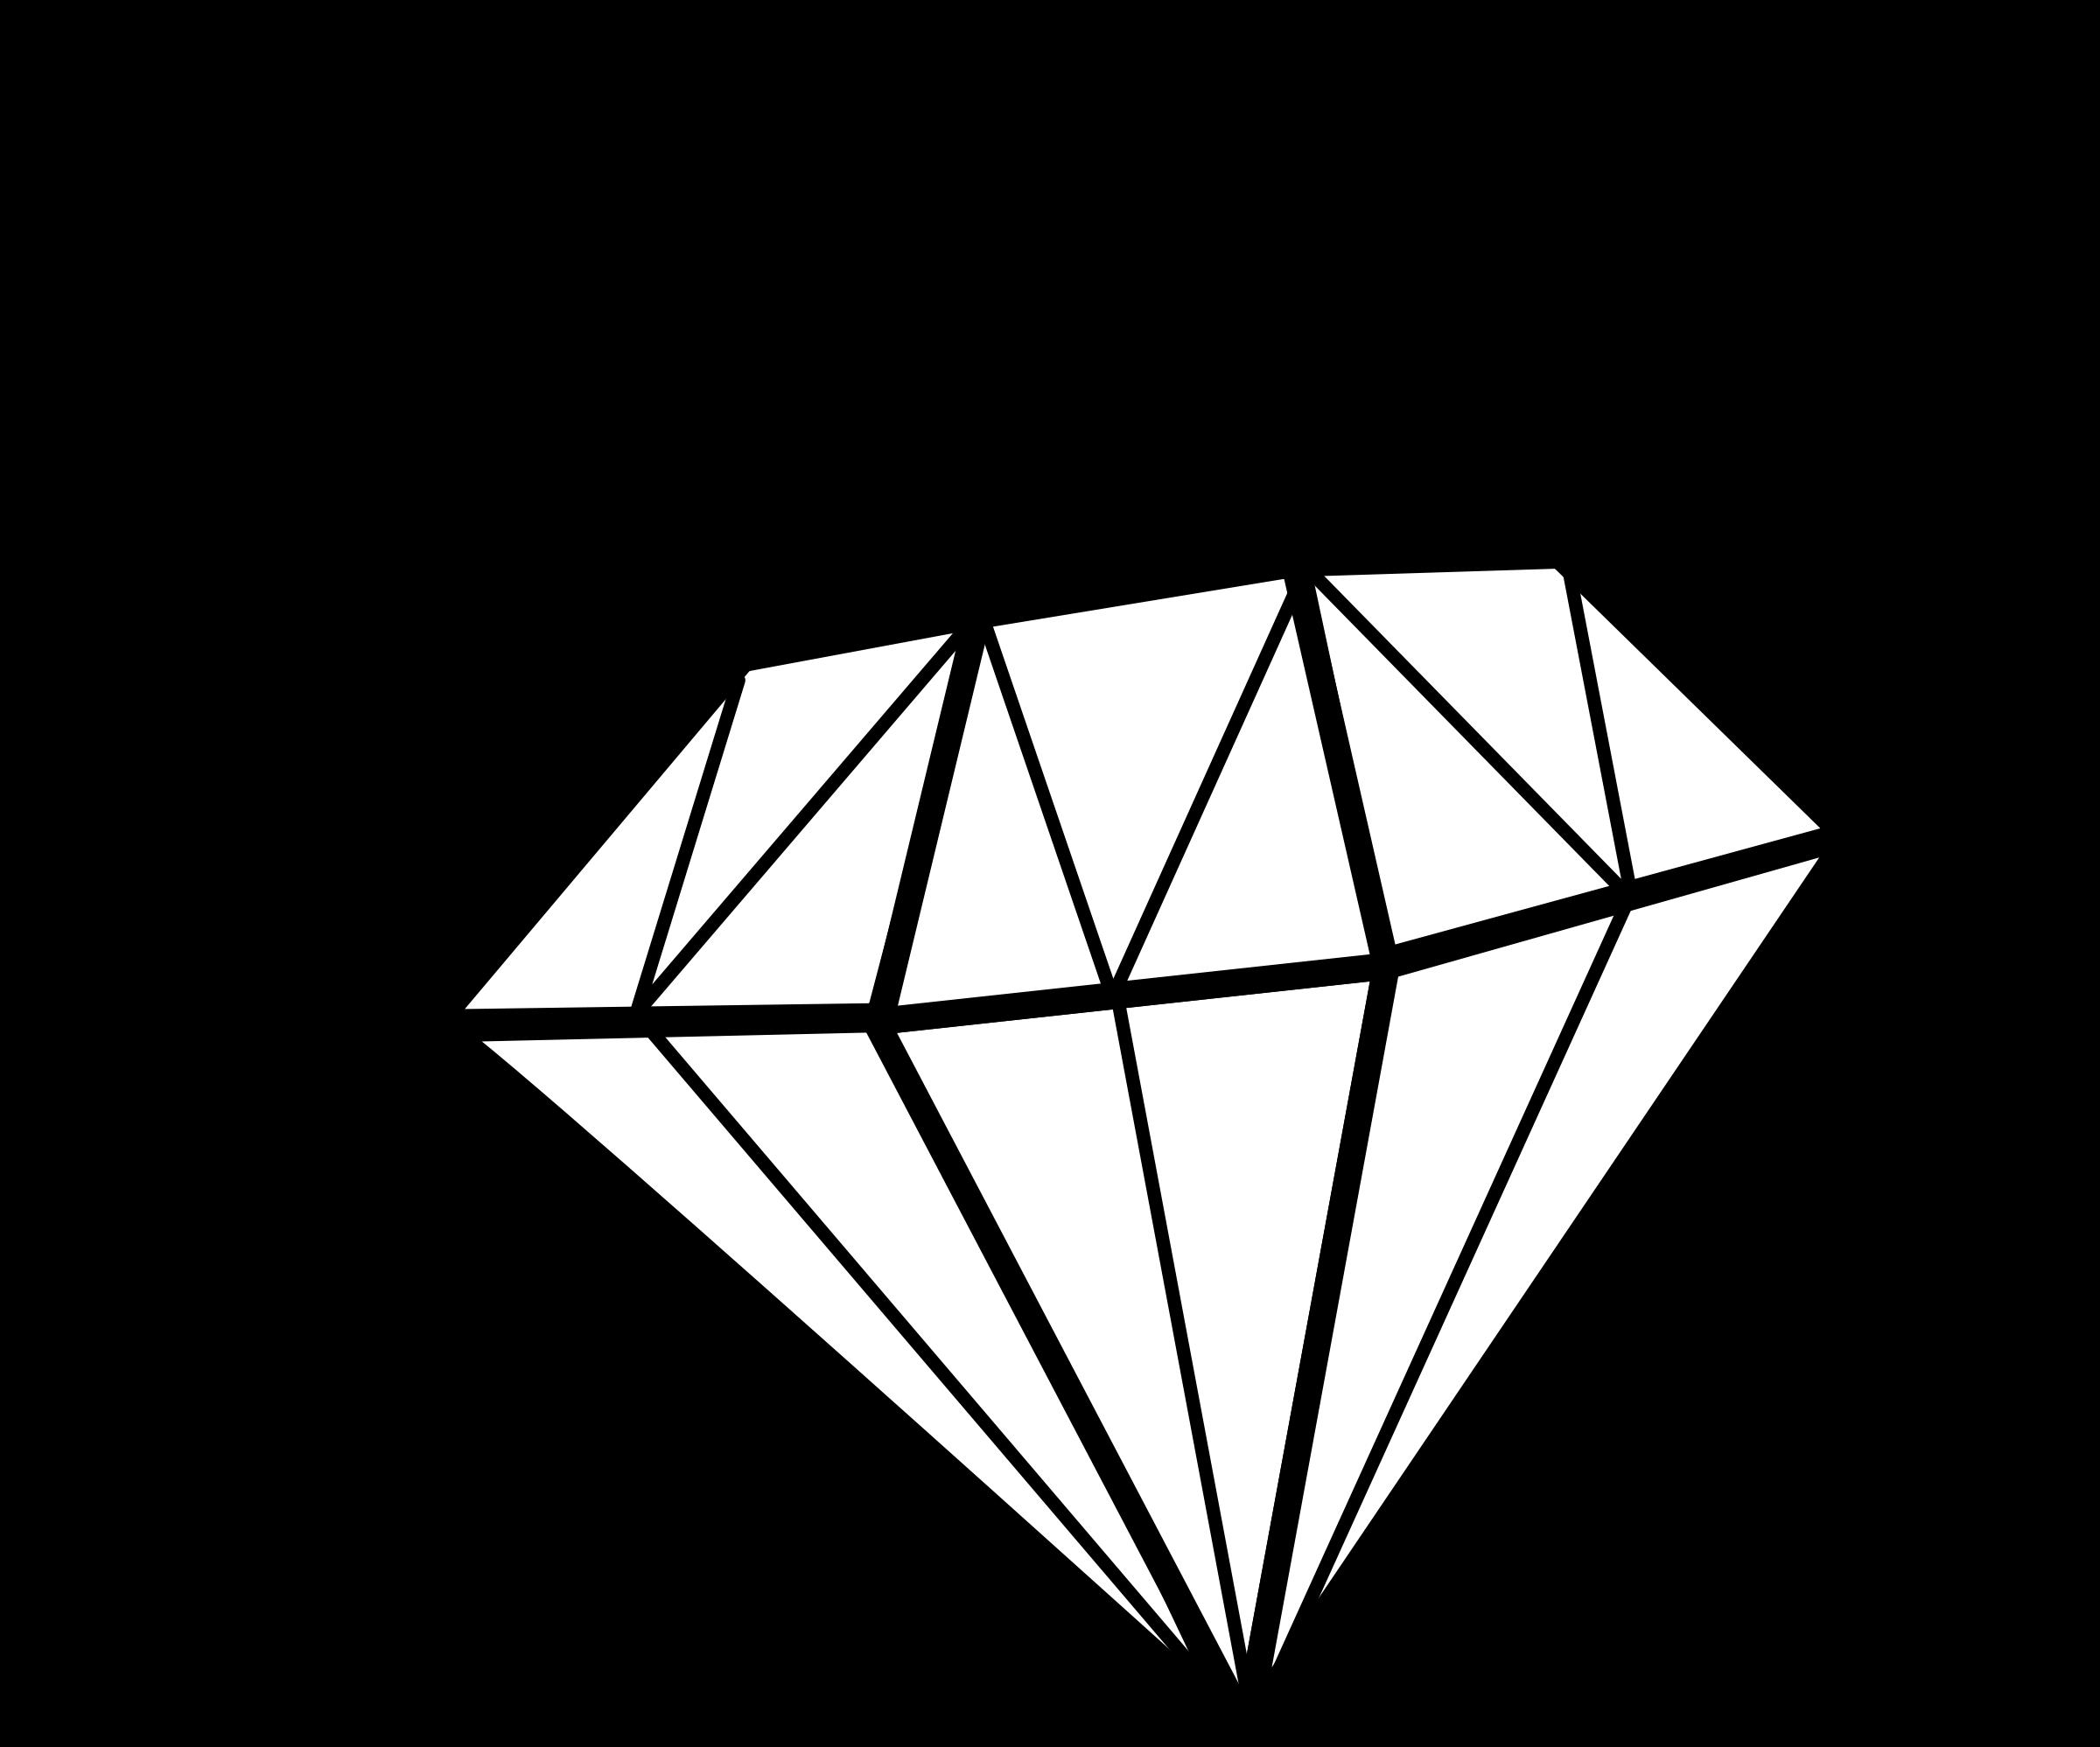 Diamond clip art free clipart images